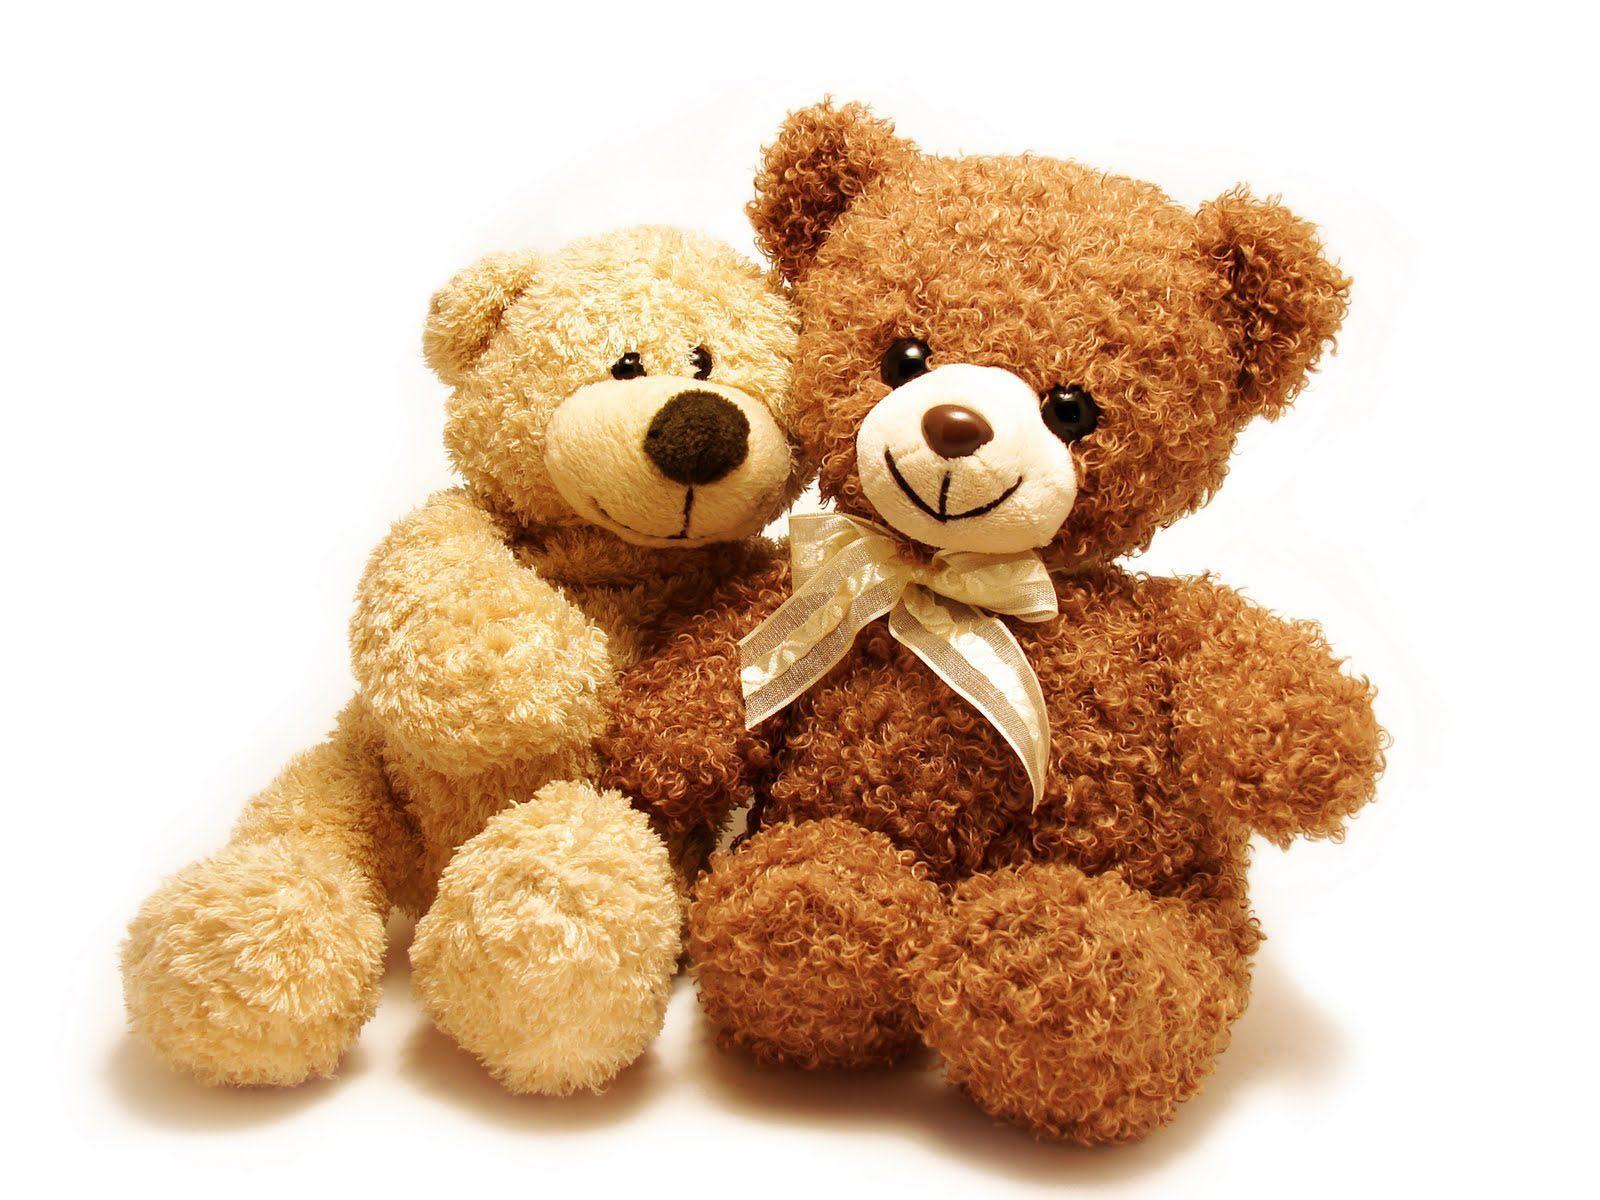 cute Teddy Love Wallpaper : cute Teddy Bear Wallpapers - Wallpaper cave